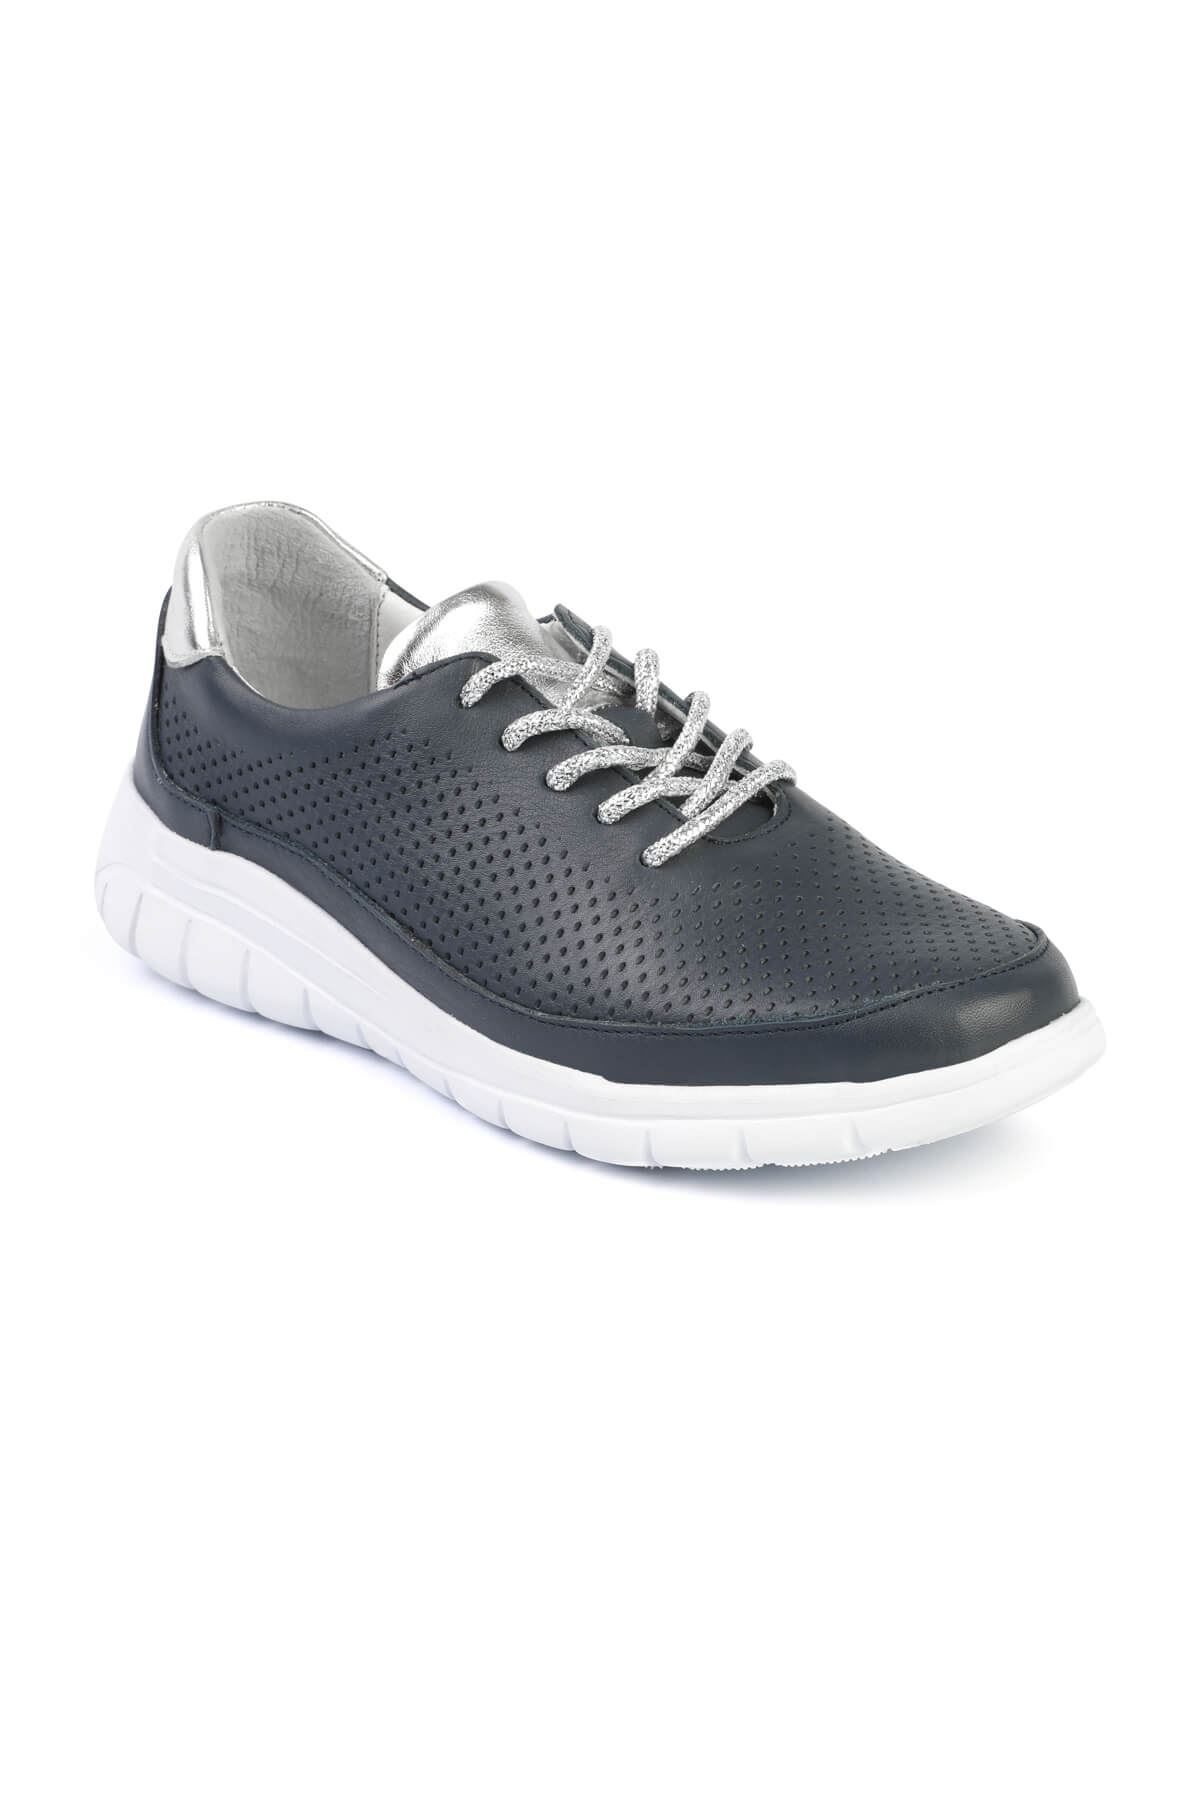 Libero FMS231 Navy Blue Sport Shoes